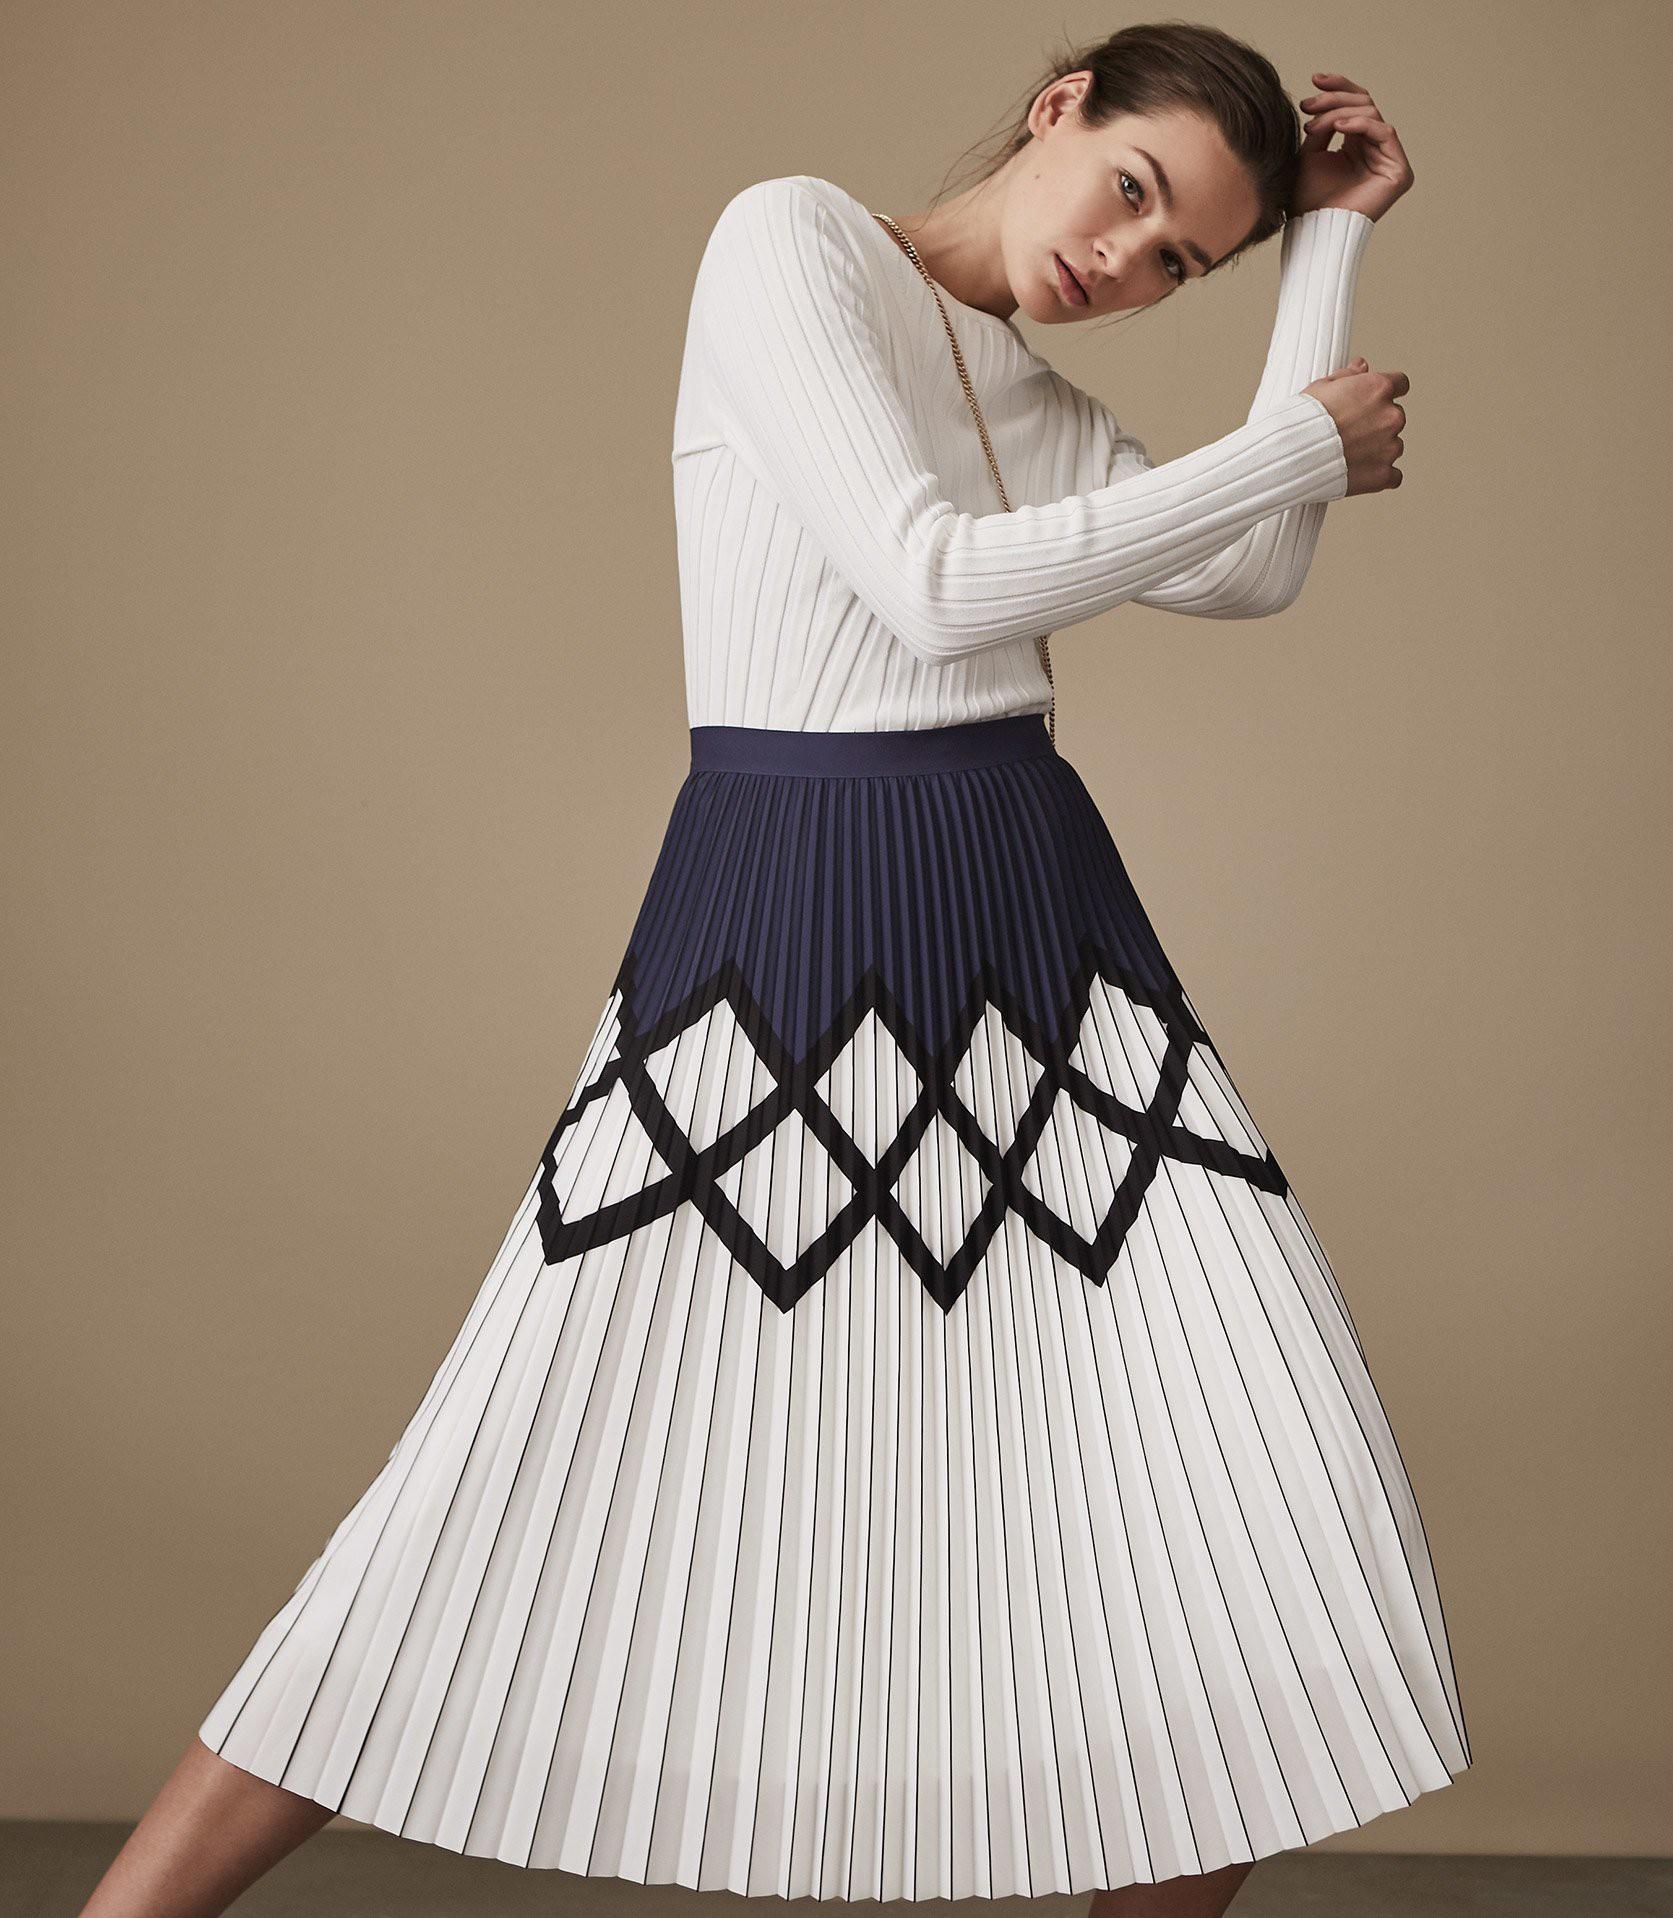 fede555e1 Reiss Elsa Printed Knife-Pleat Midi Skirt Navy/White - 10   Products ...